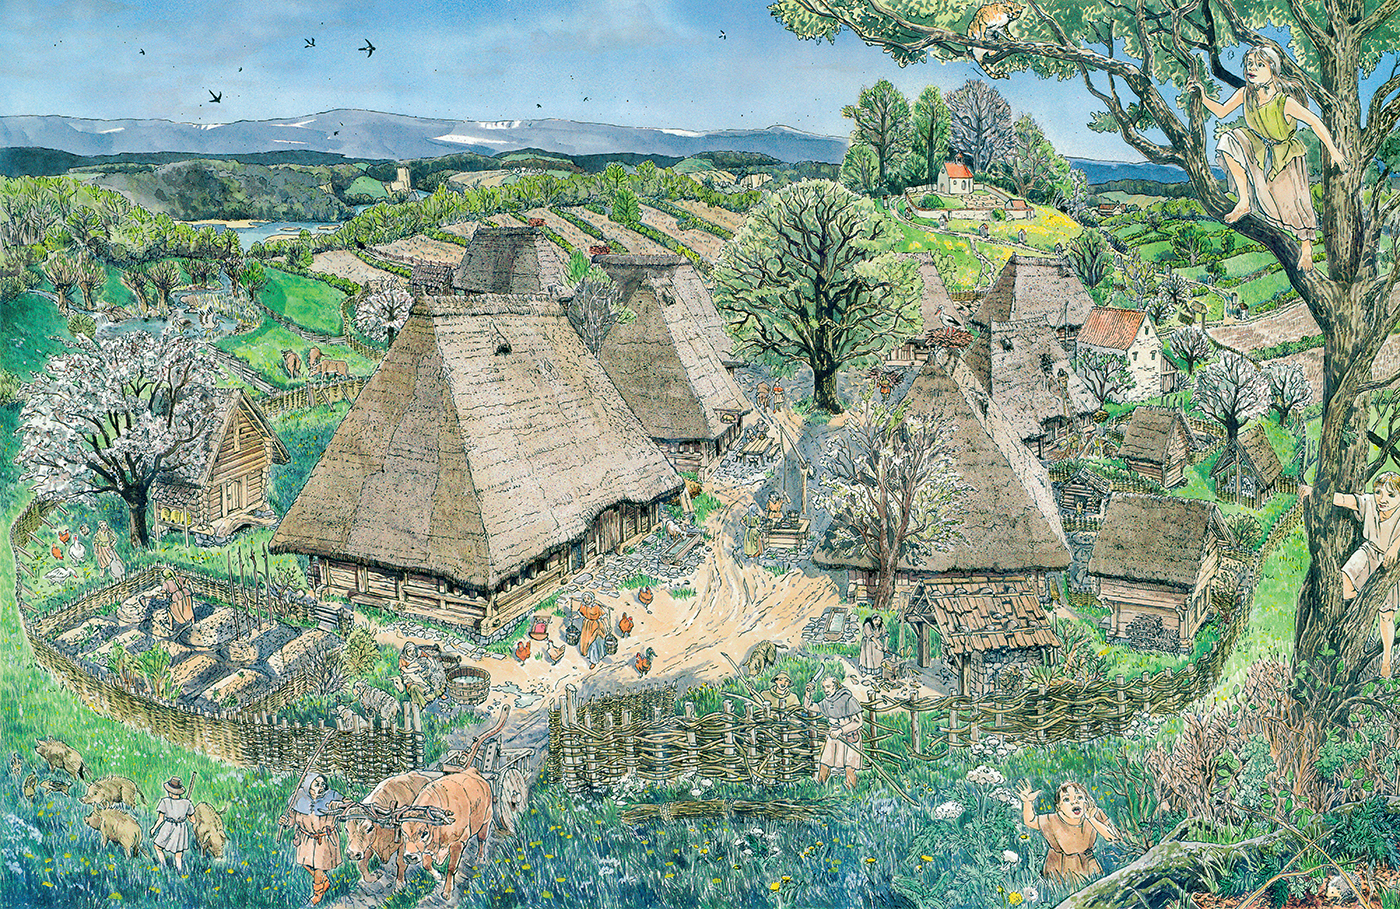 Dorf - Alltag im Mittelalter